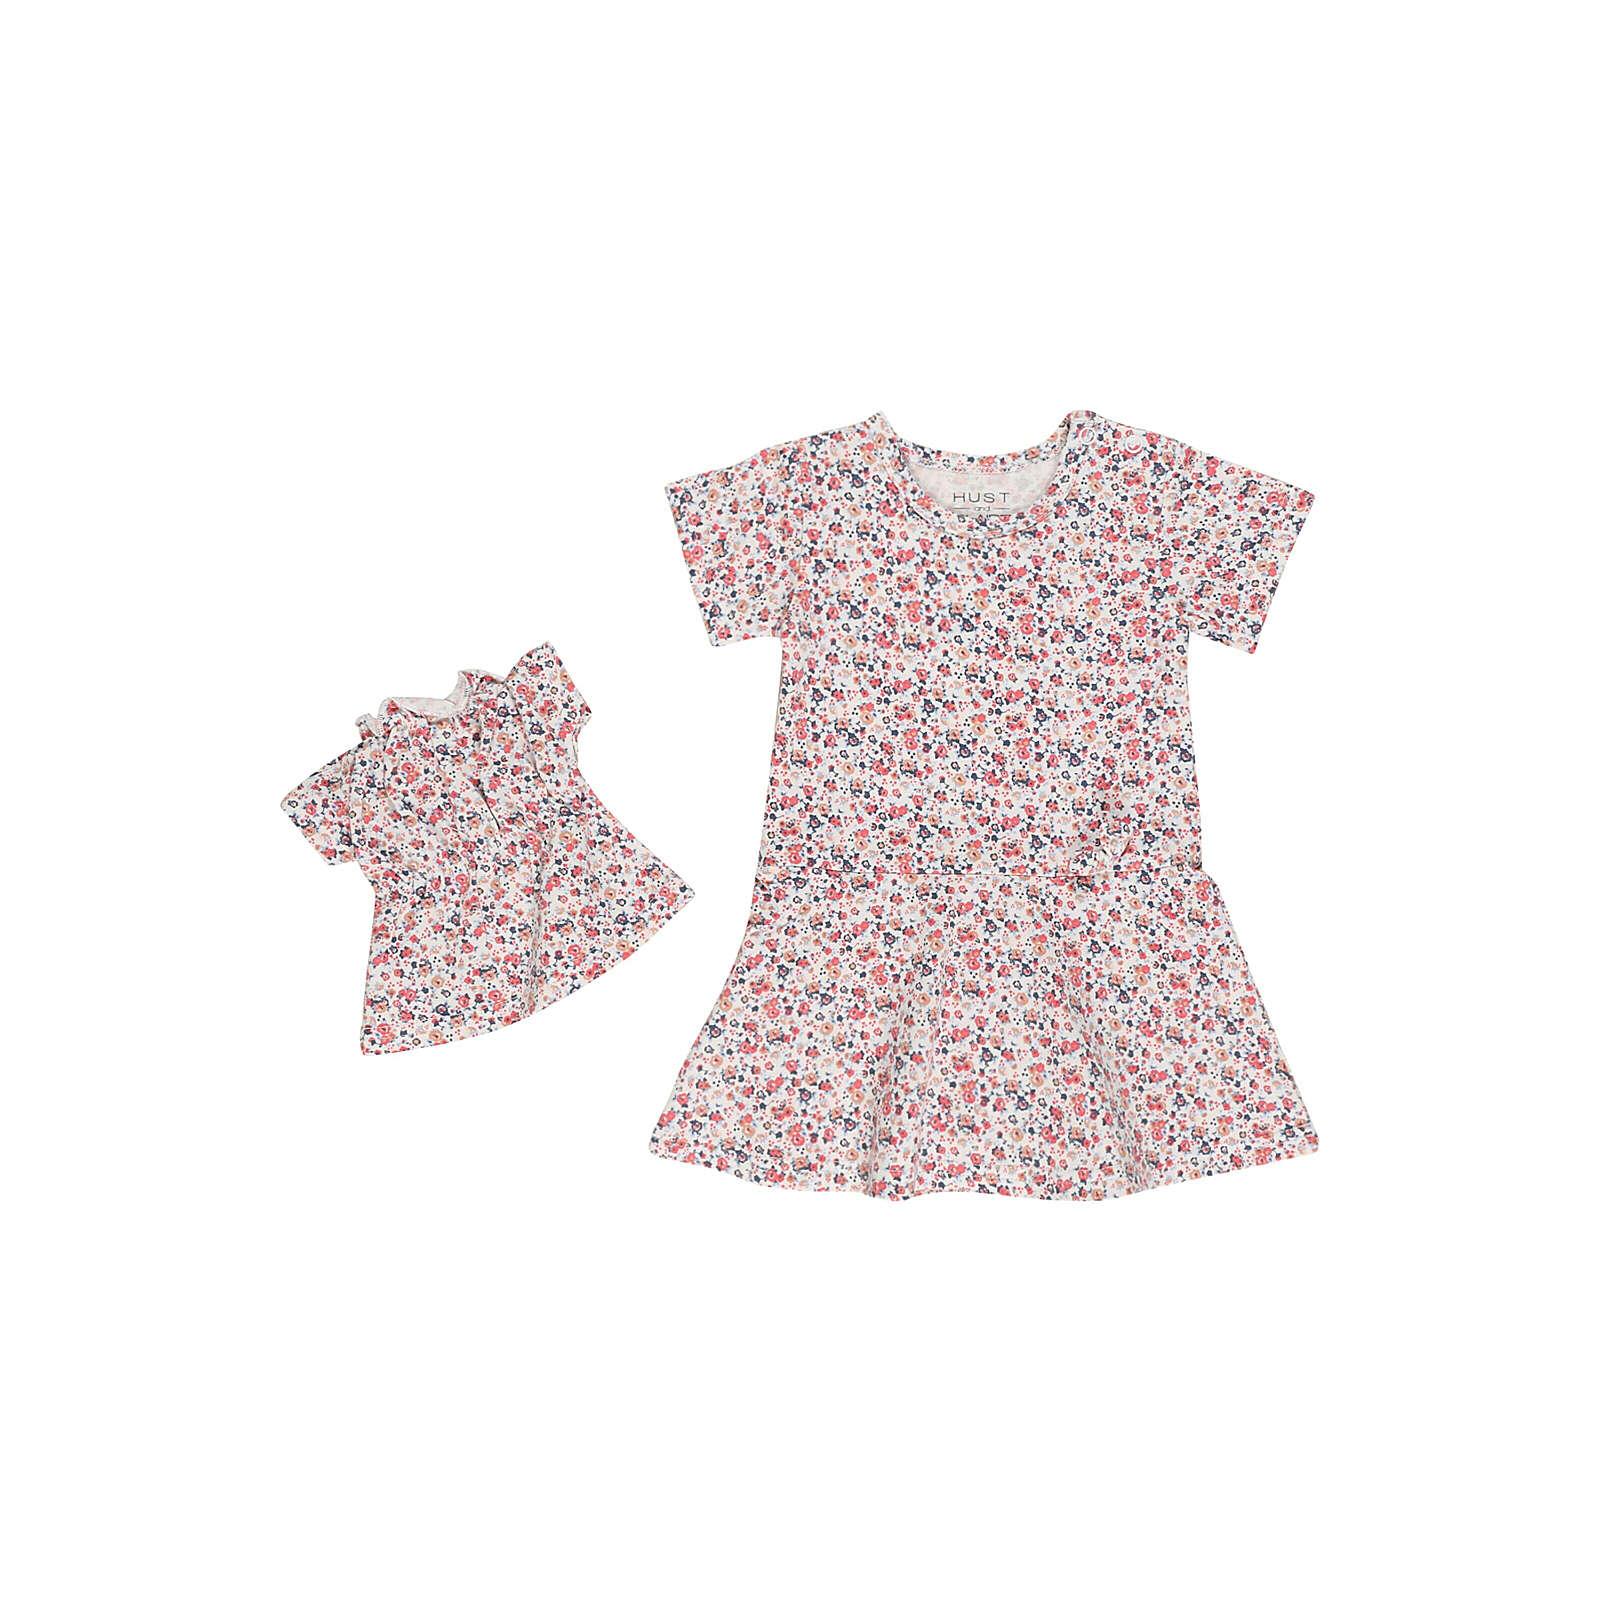 Hust & Claire set madia - romper Anzüge pink Damen Gr. 56